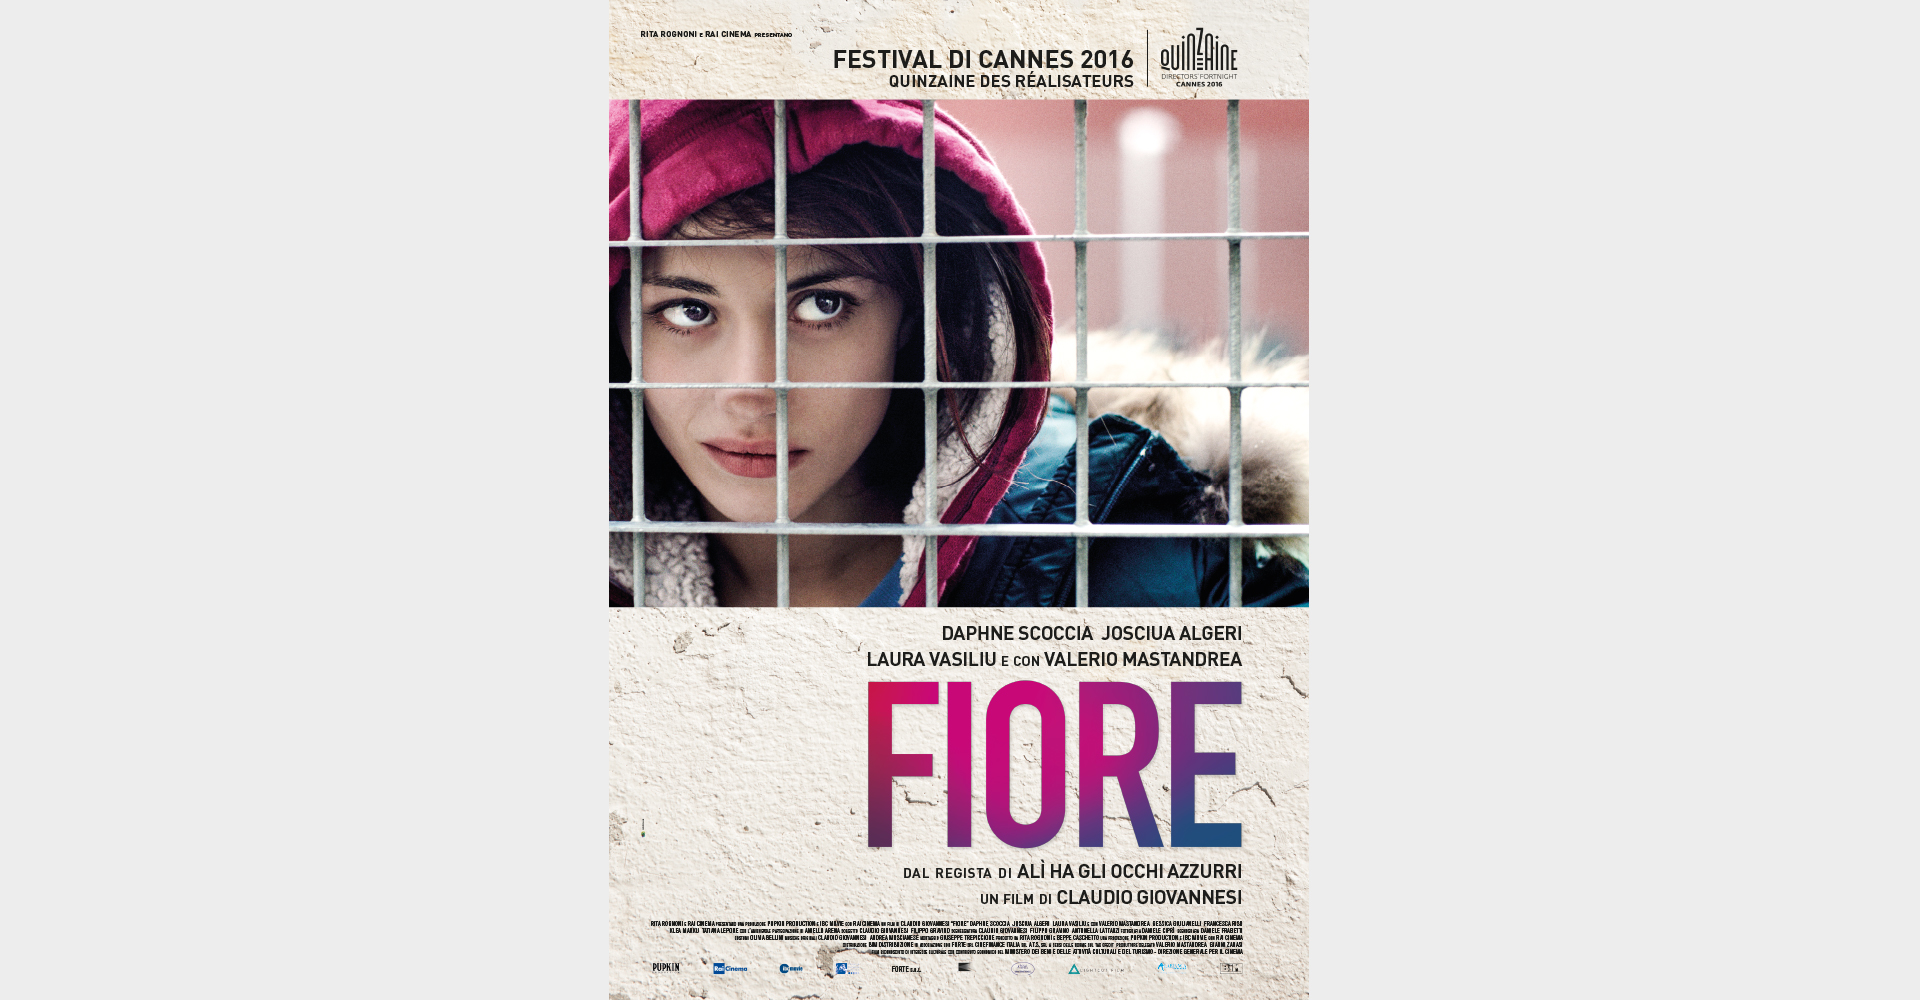 Fiore_01